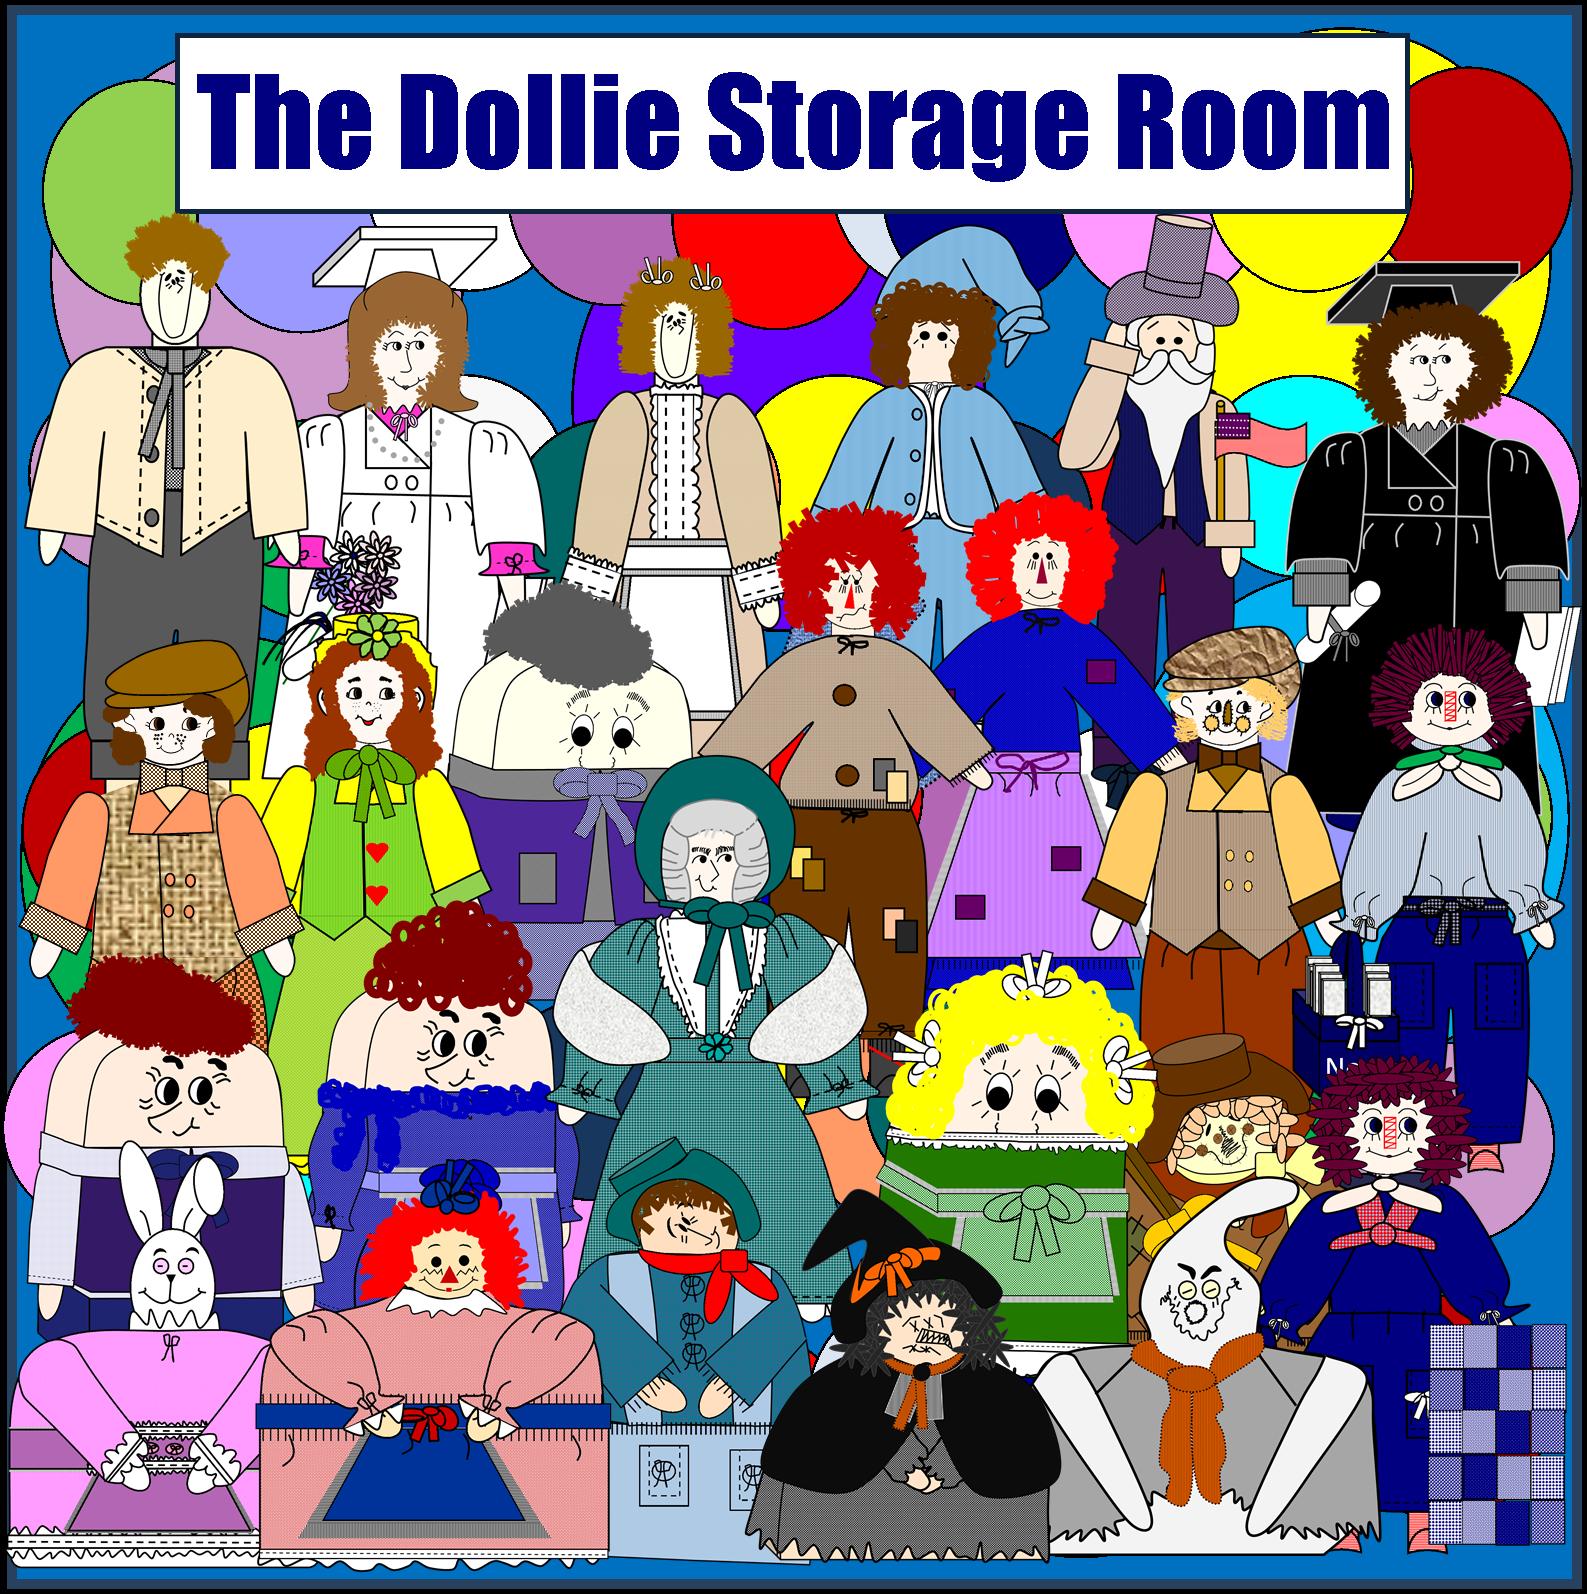 The Dollie Storage Room Blog